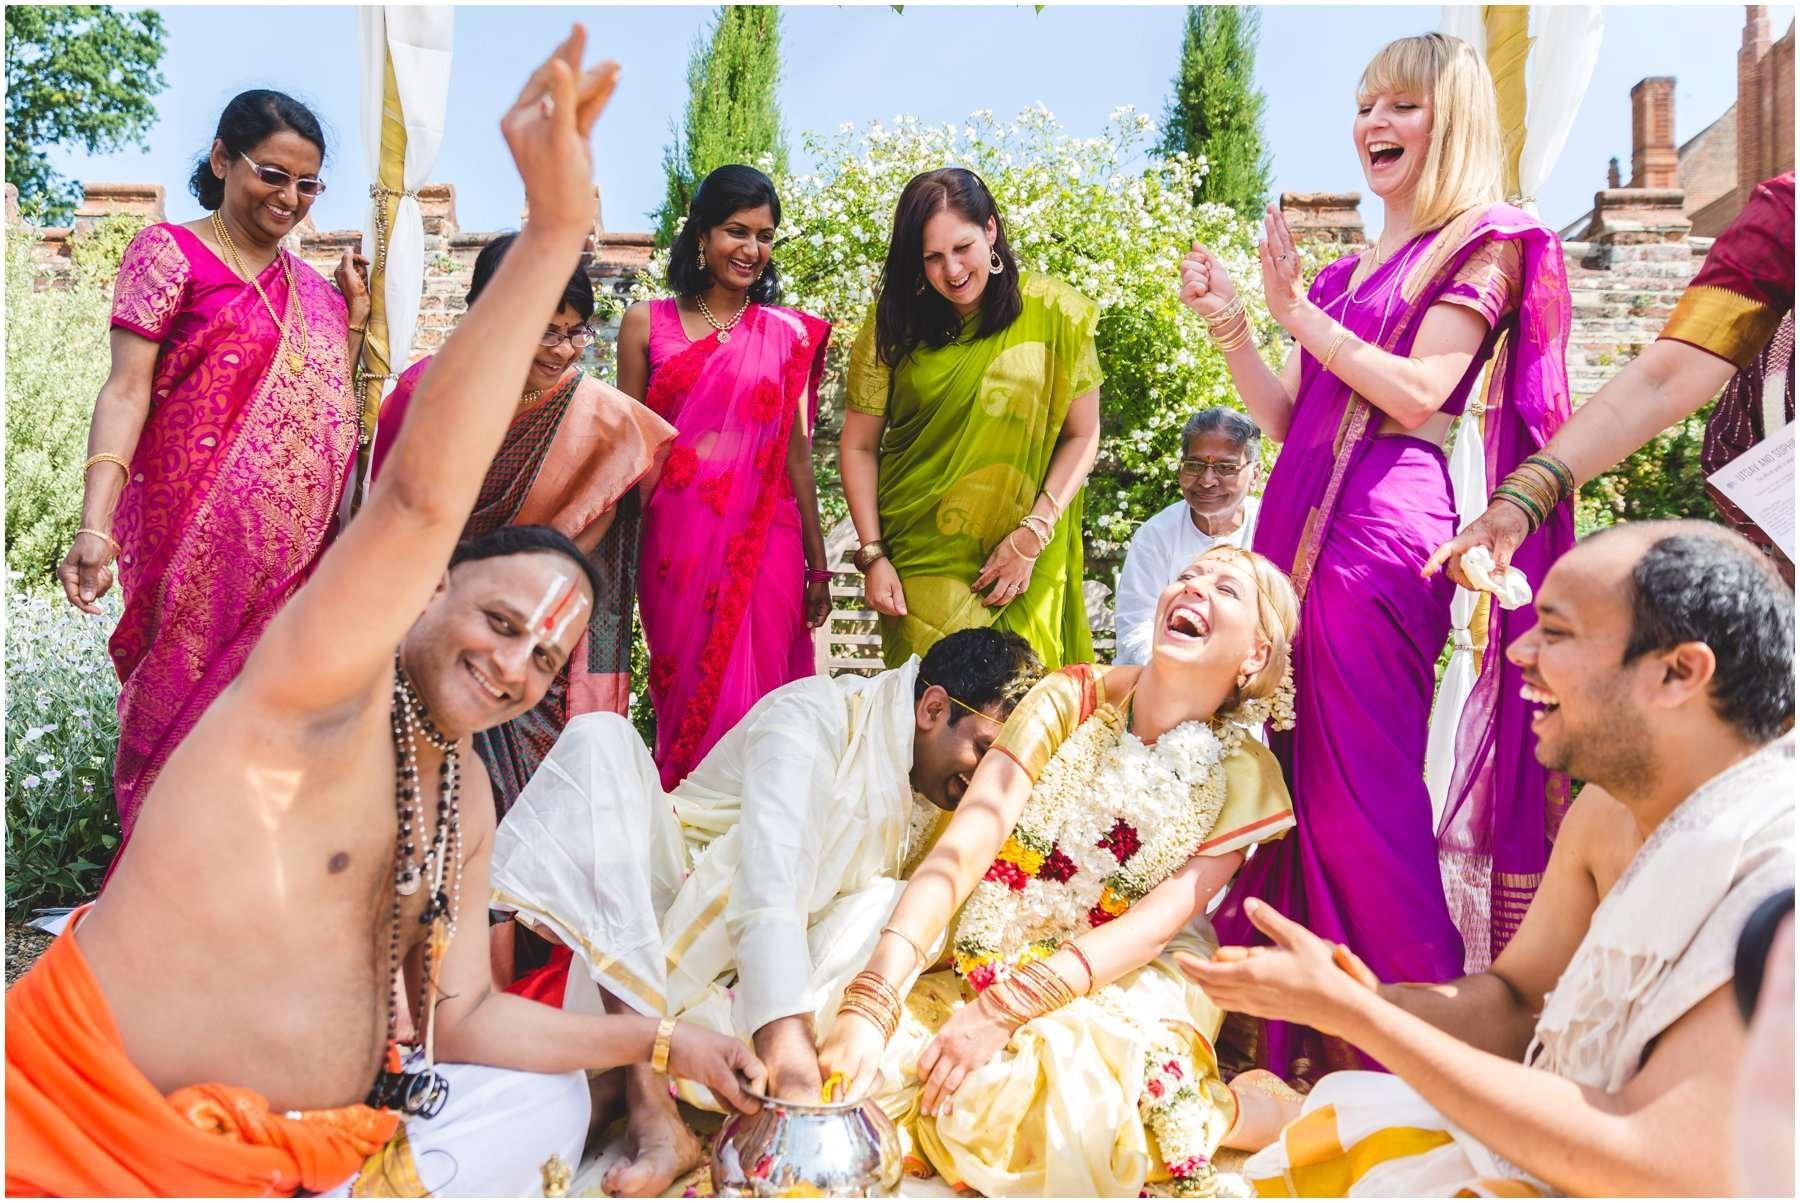 OXNEAD HALL HINDU WEDDING - SOPHIE AND UTSAV - NORFOLK WEDDING PHOTOGRAPHER 1